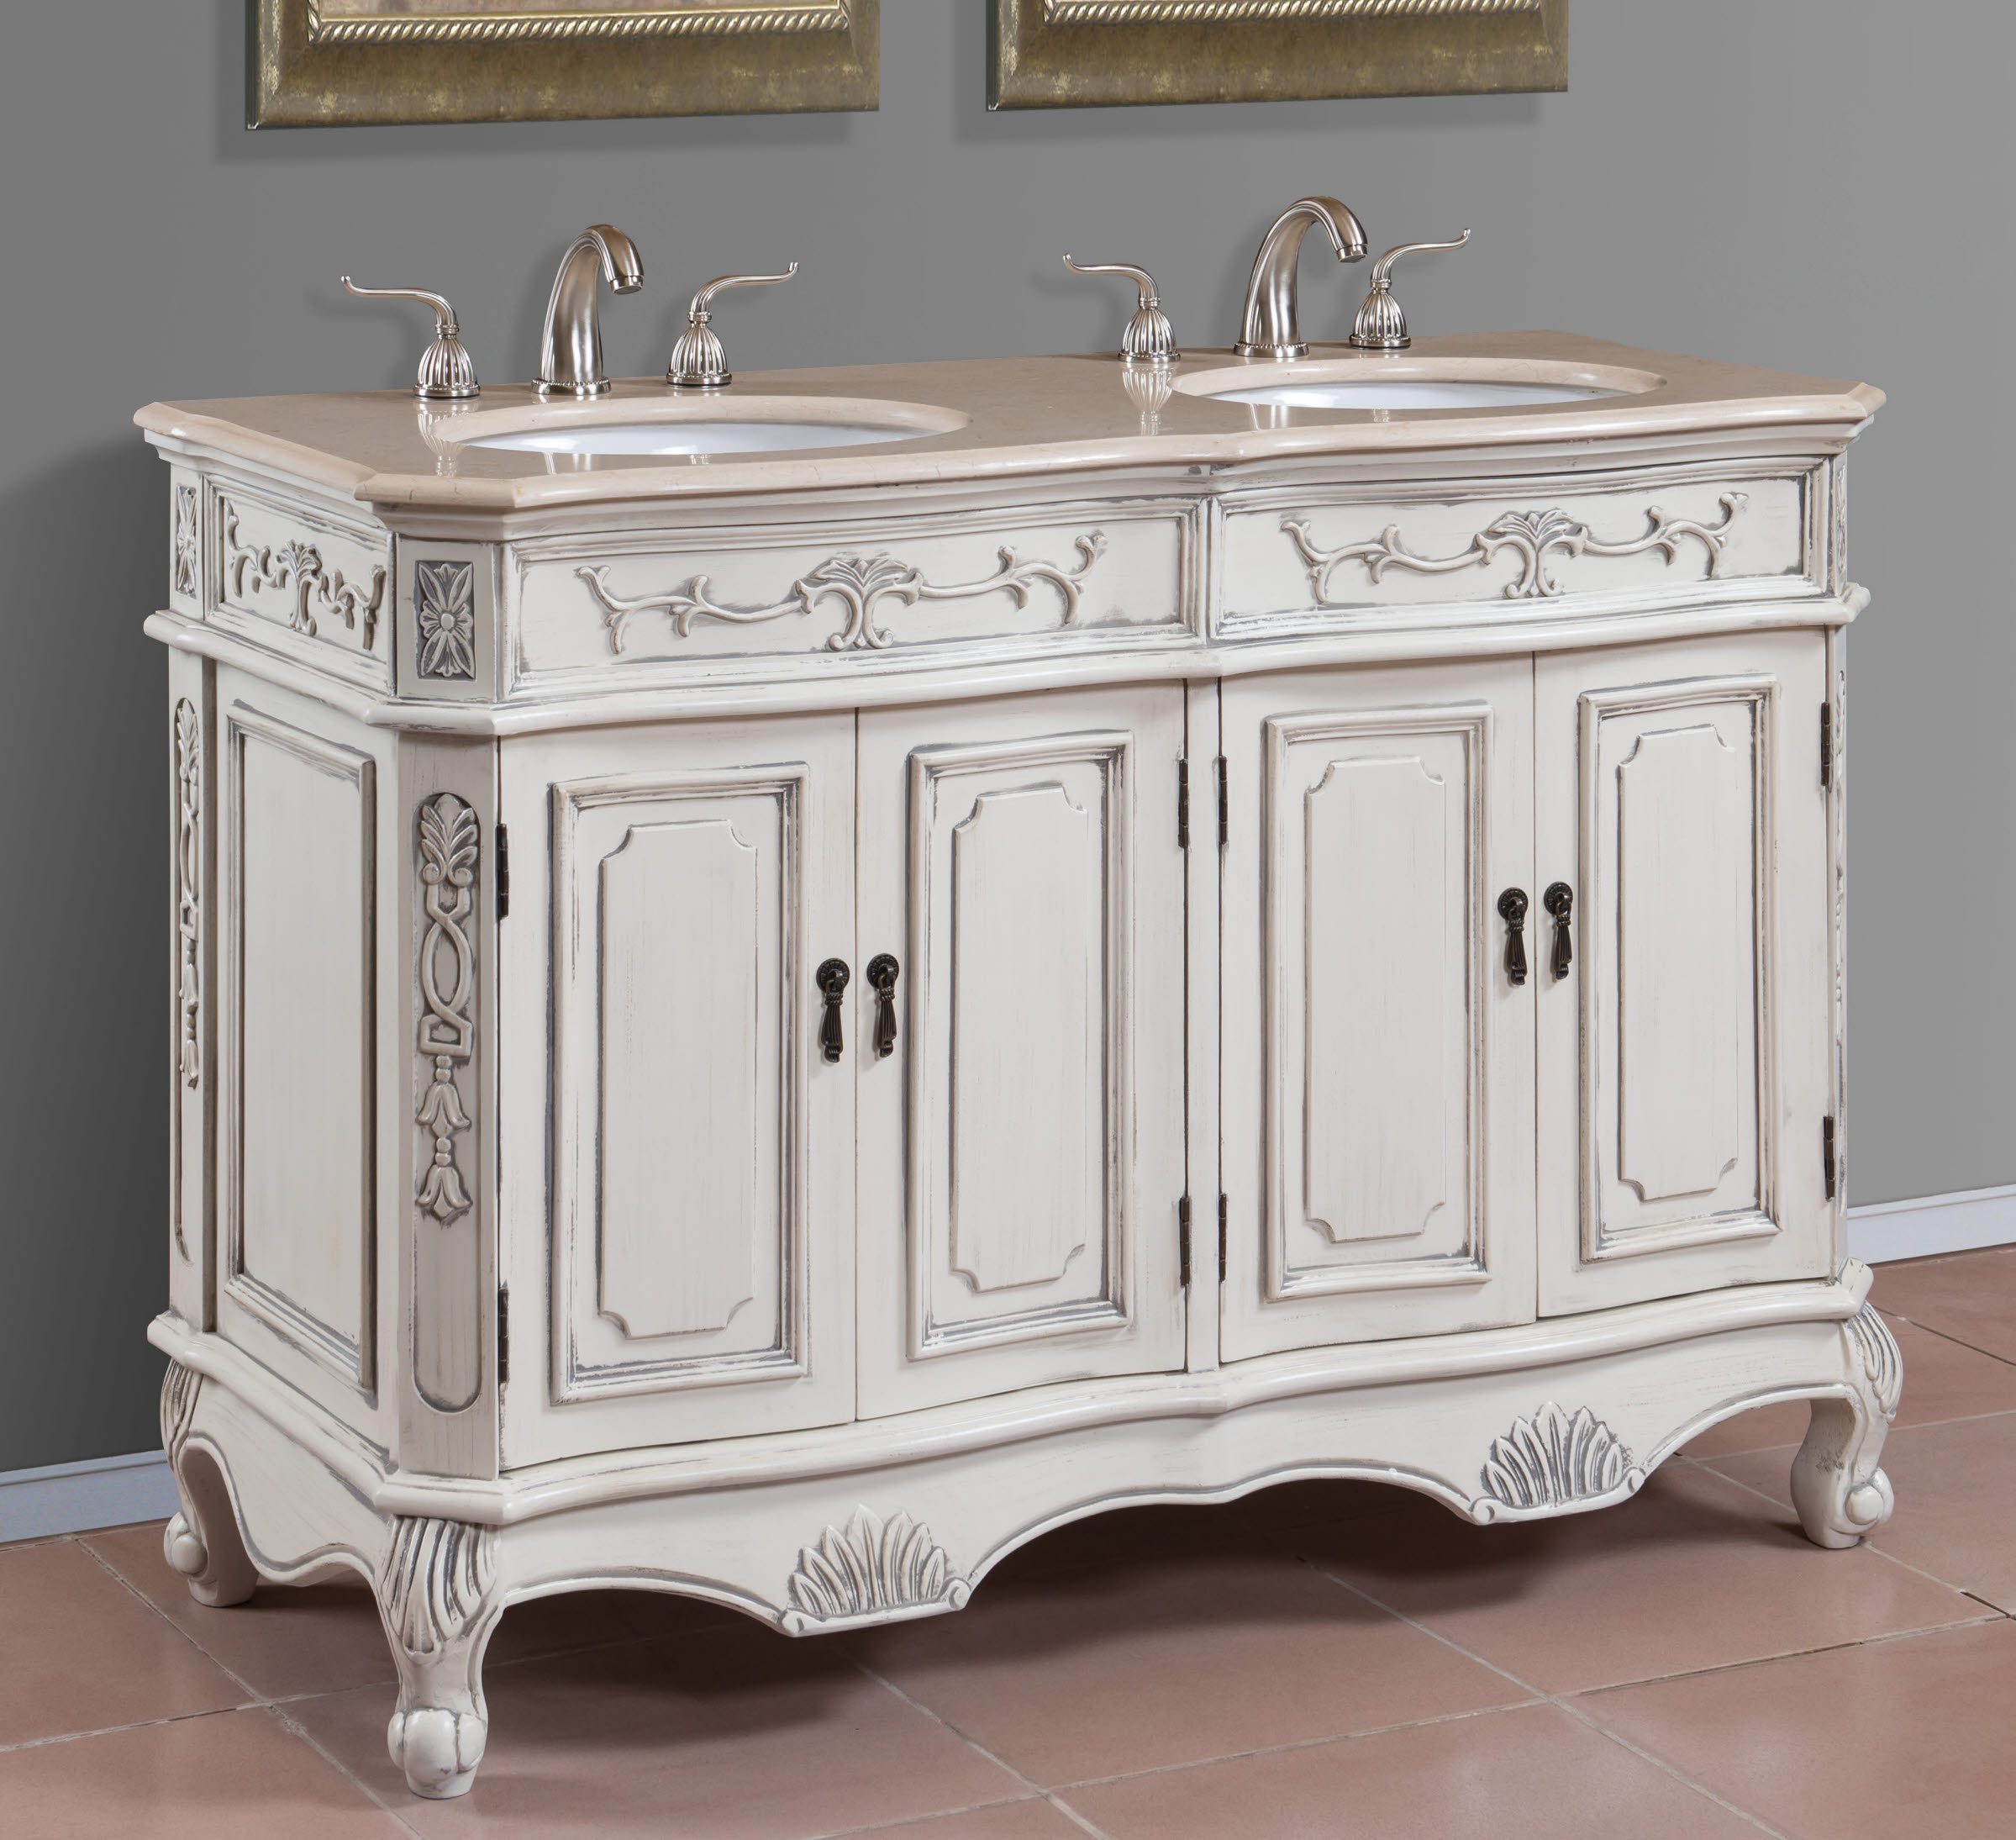 48 Inch Double Sink Bathroom Vanity – HomesFeed